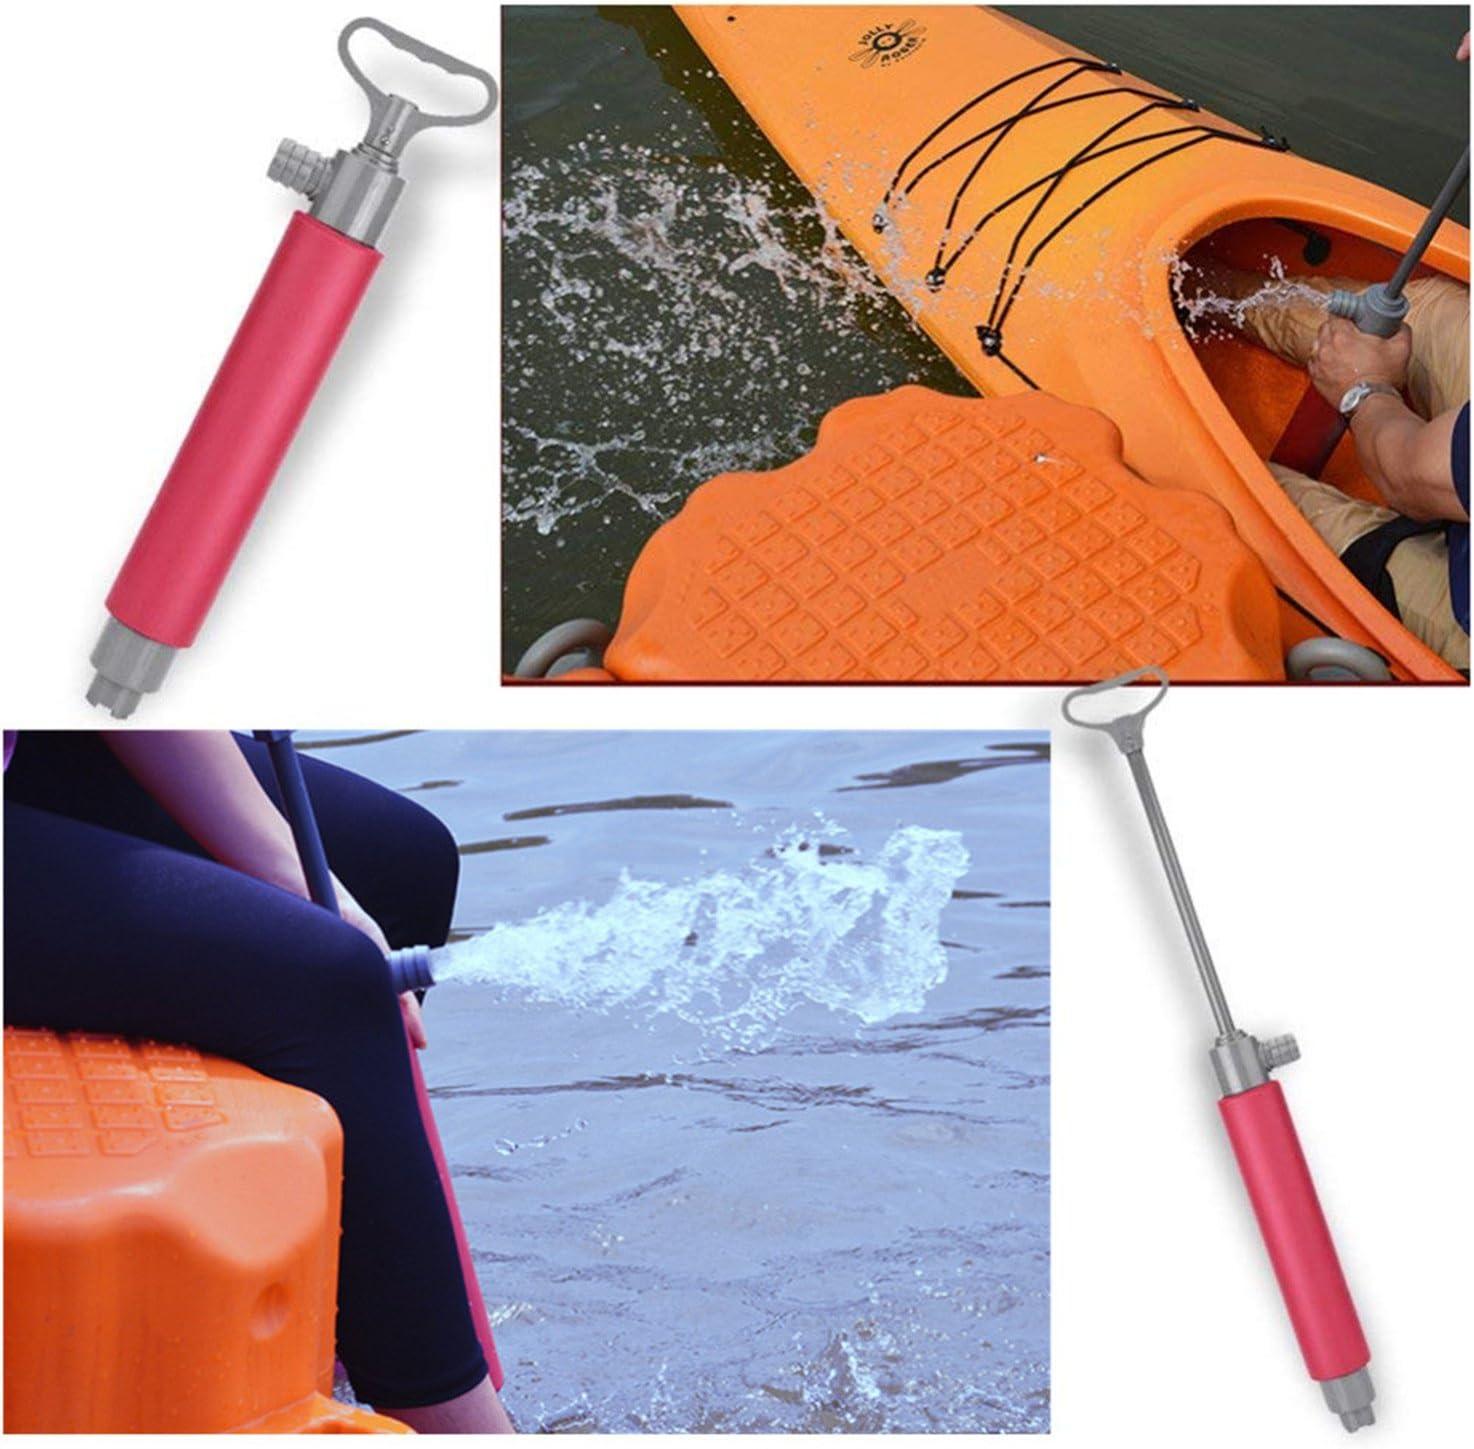 Yarr Store Kayak Bilge Hand Pump Floating Manual Water Pump Emergency Hand Pump for Kayak Rescue Canoe Accessories